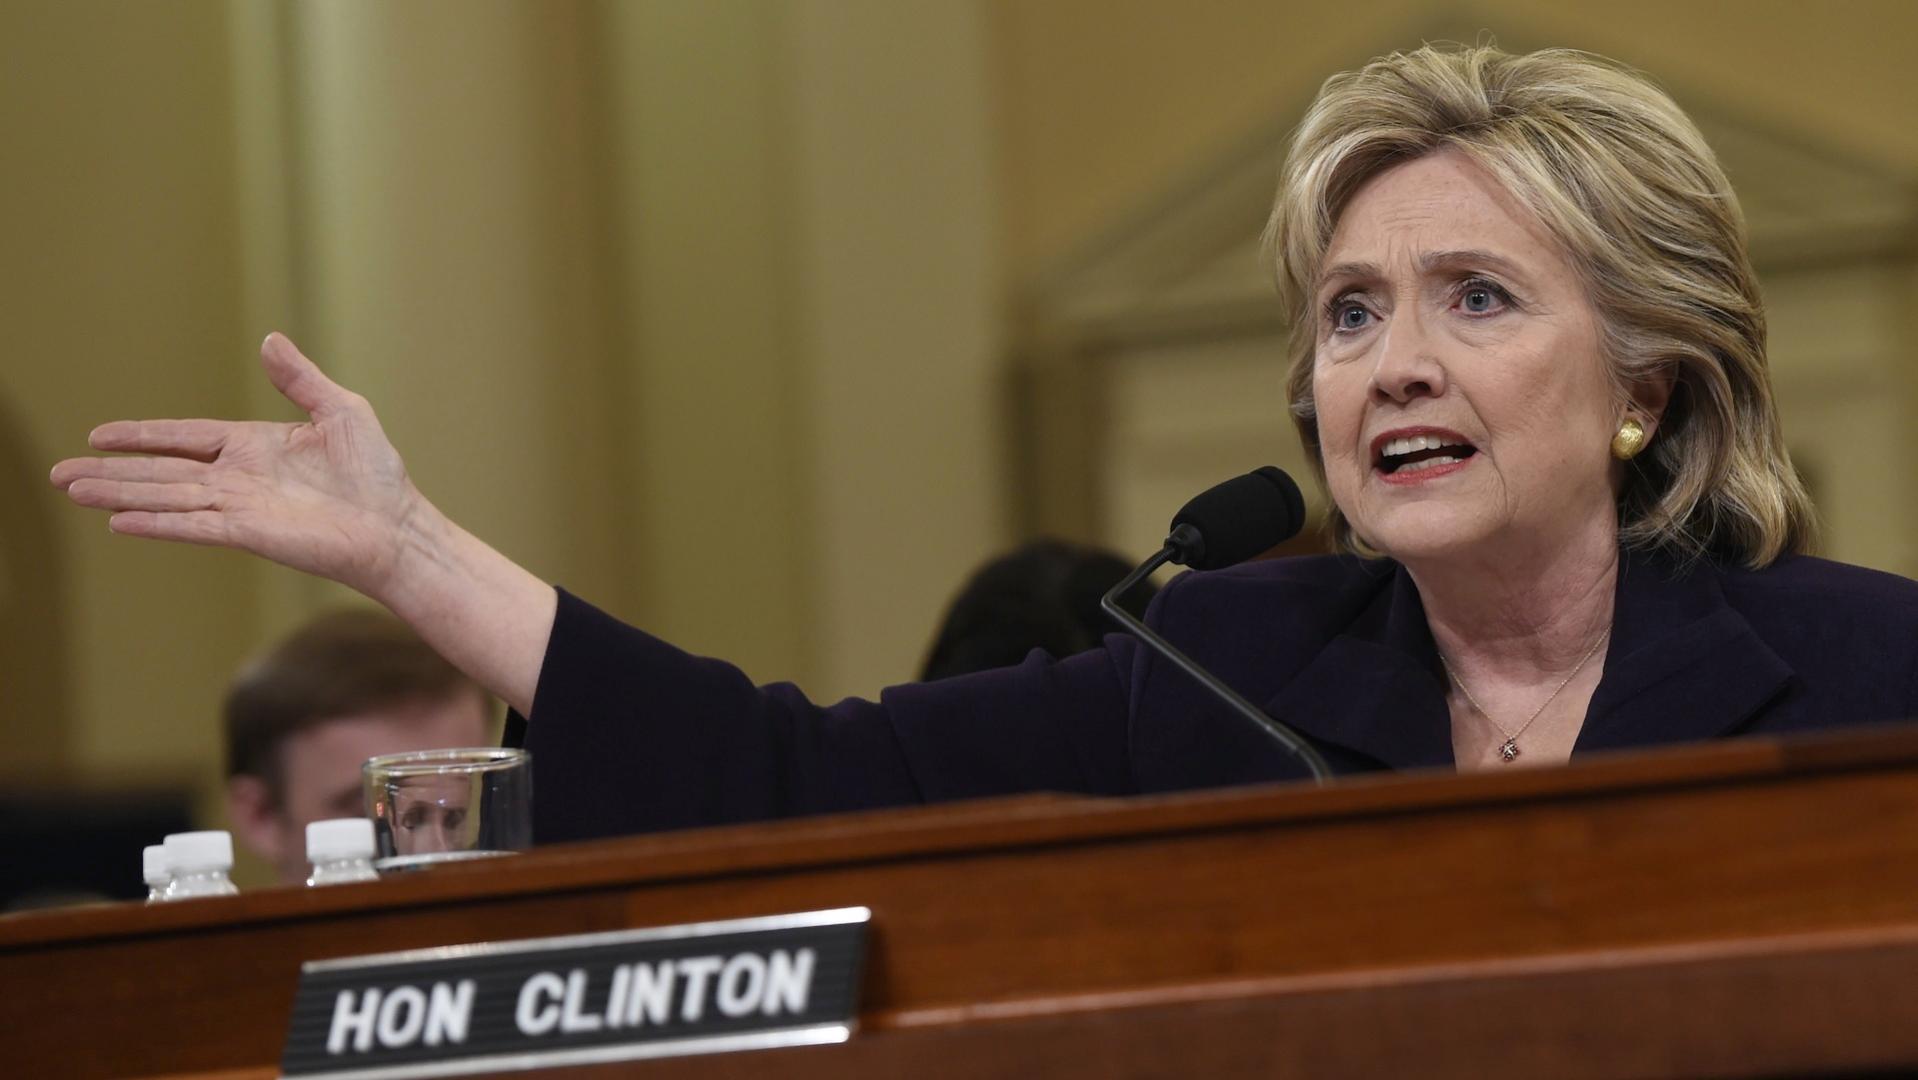 The Daily 202: Eight reasons Hillary Clinton won the Benghazi hearing